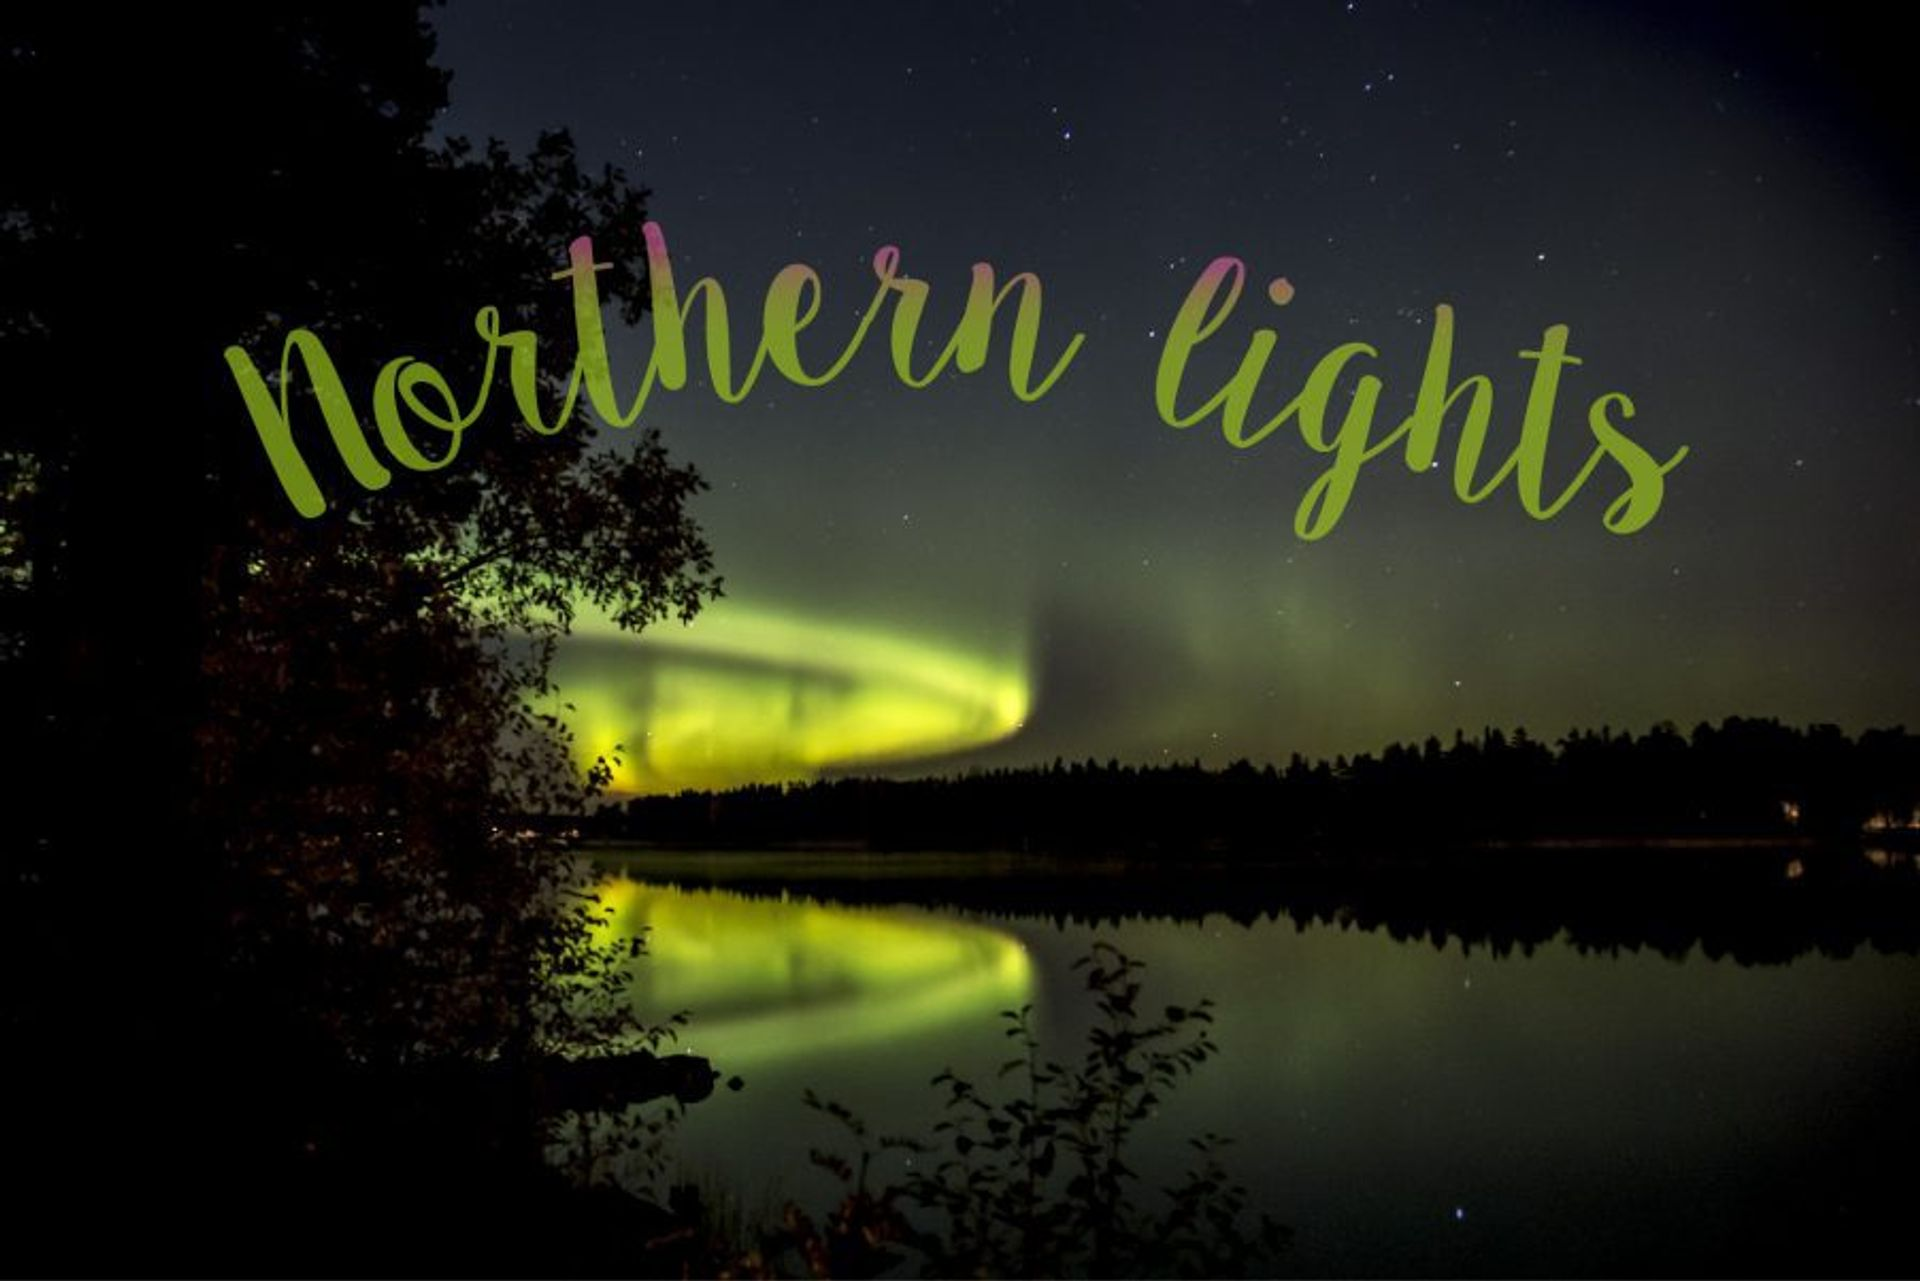 Norrsken_featured-image-01-902x602